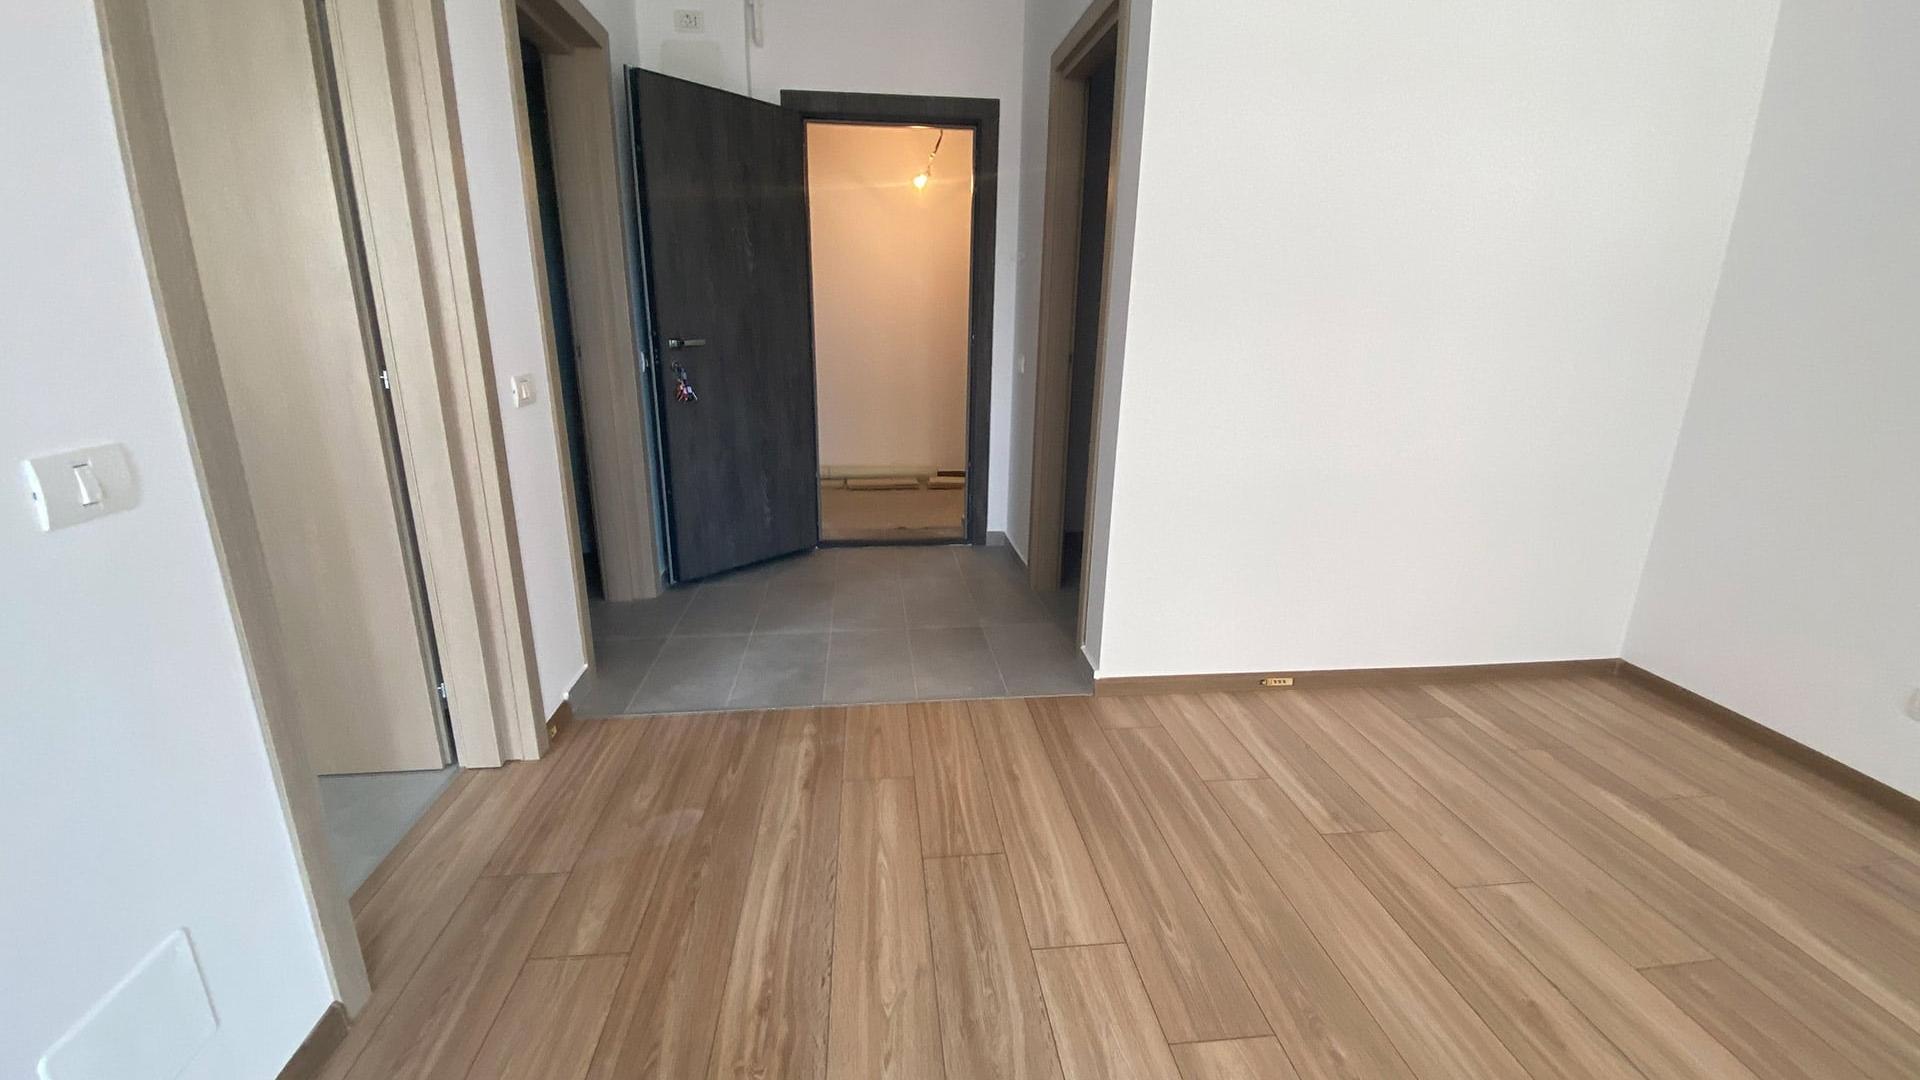 Stadiu executie Uverturii Residence 14 Septembrie 2020 - Apartamente si garsoniere de vanzare Militari, Gorjului - 5